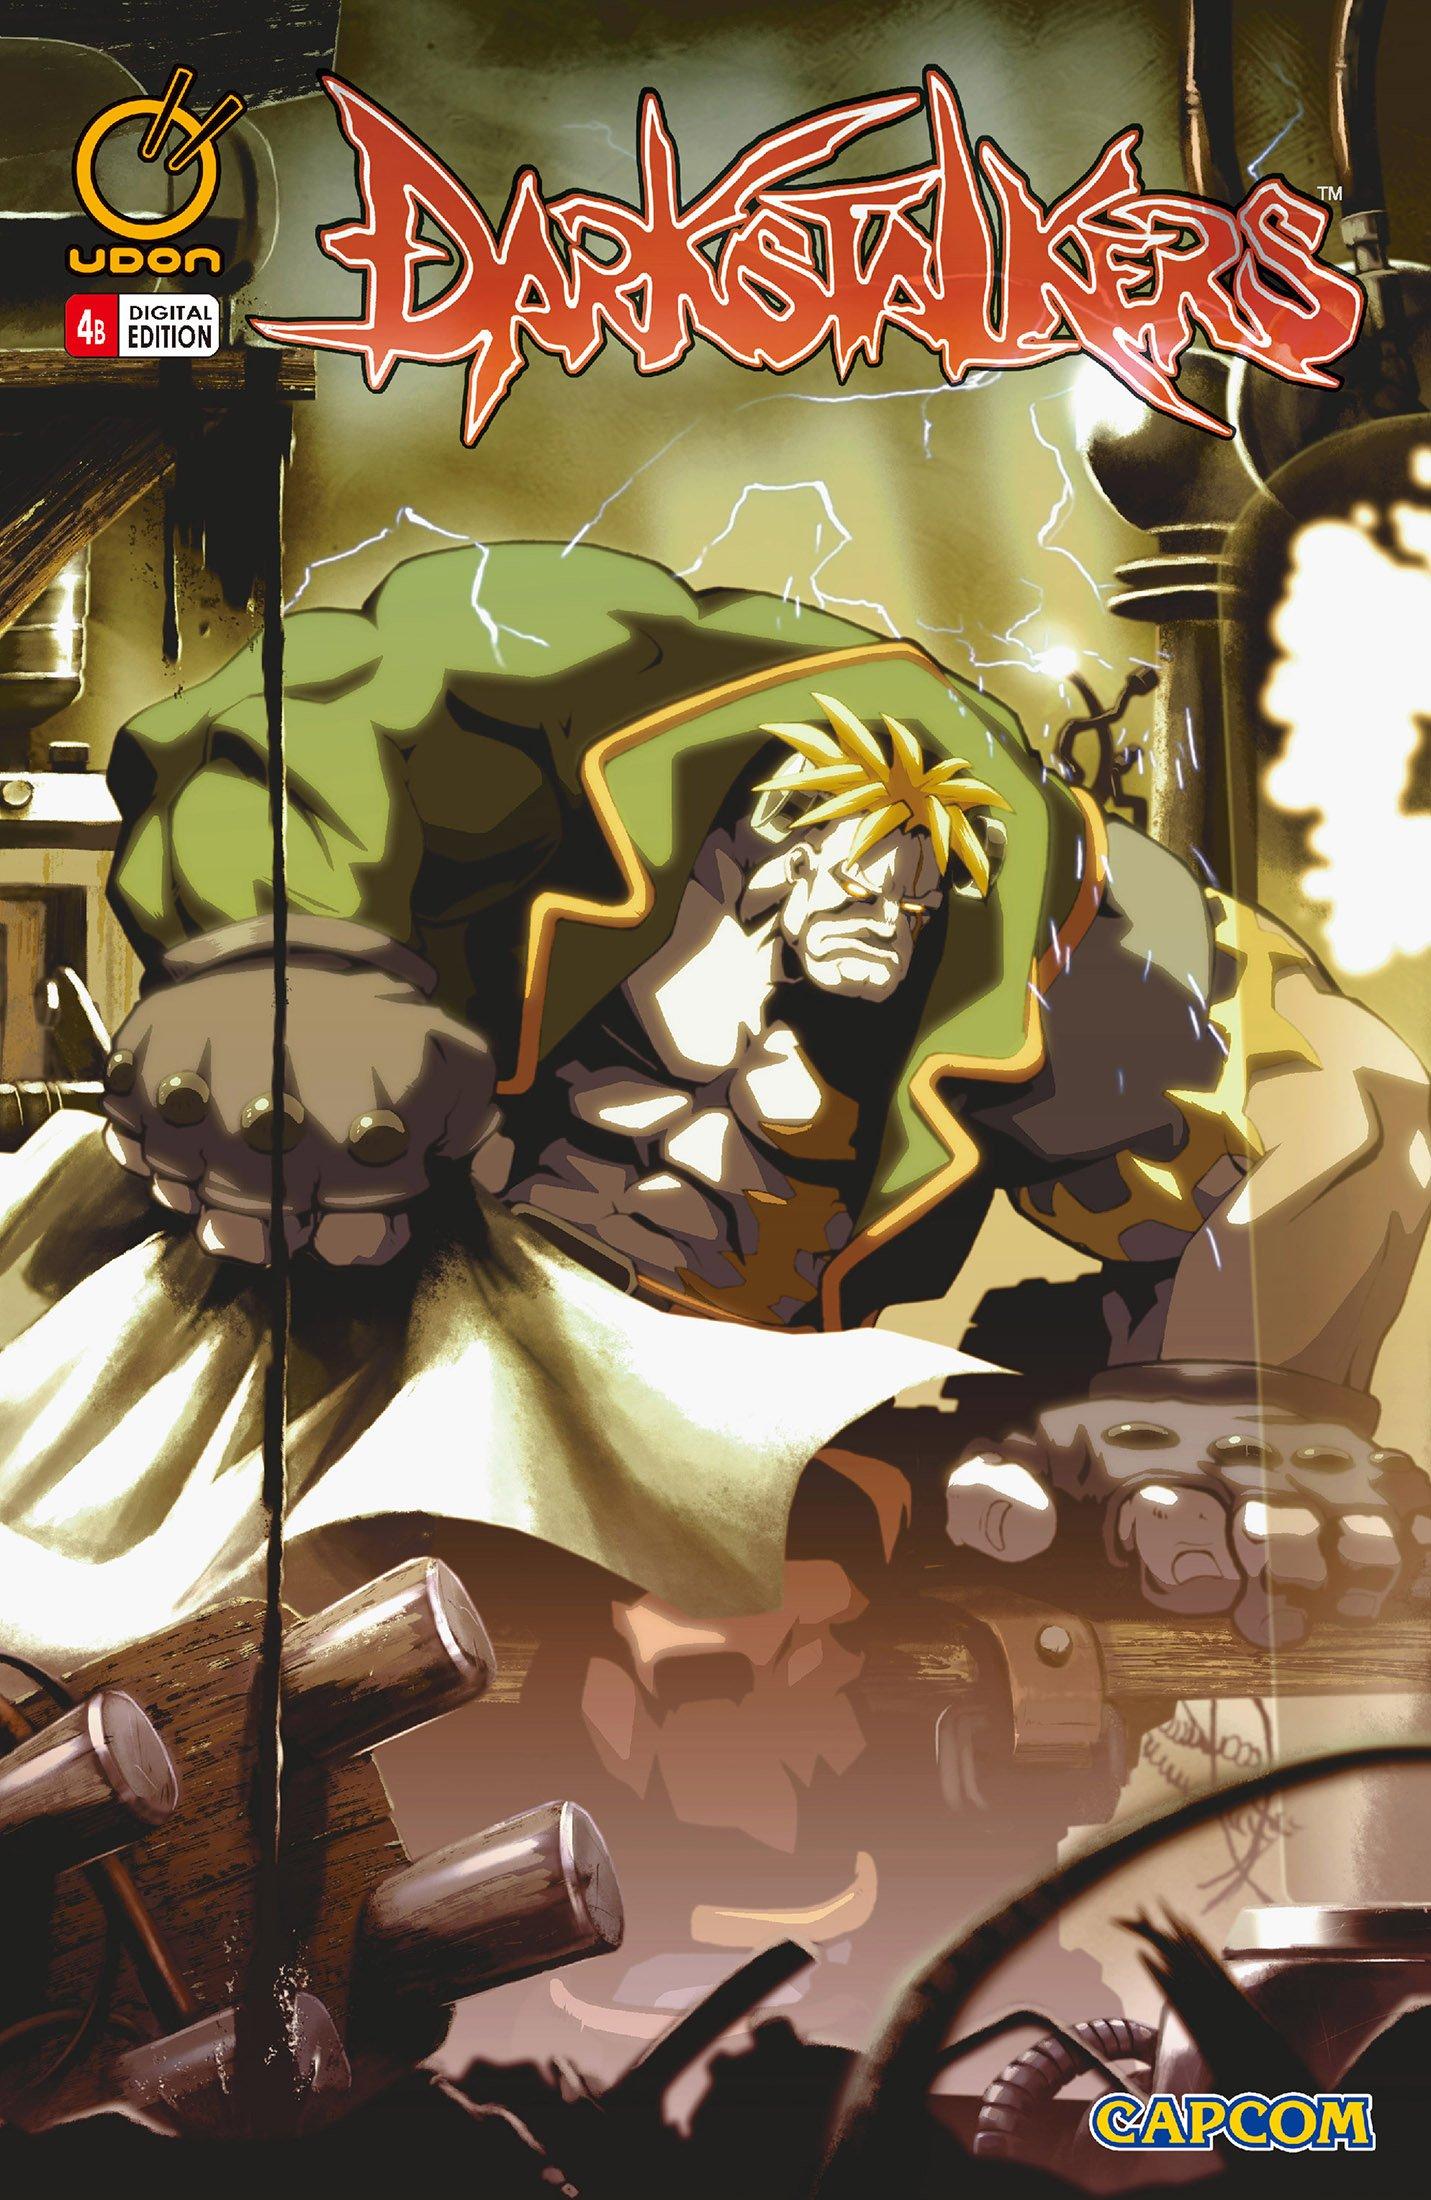 Darkstalkers 004 (February 2005) (Cover B)